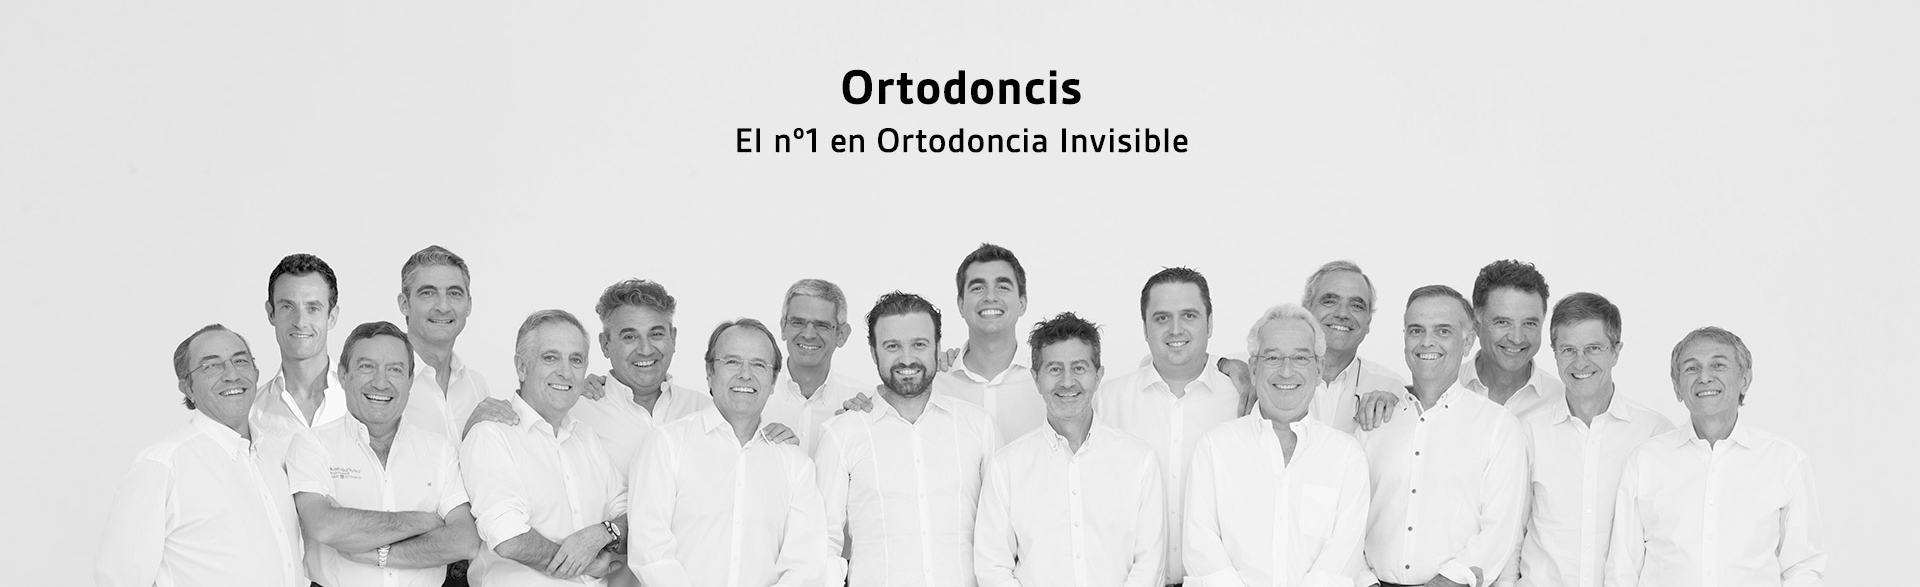 Clinicas Ortodoncis